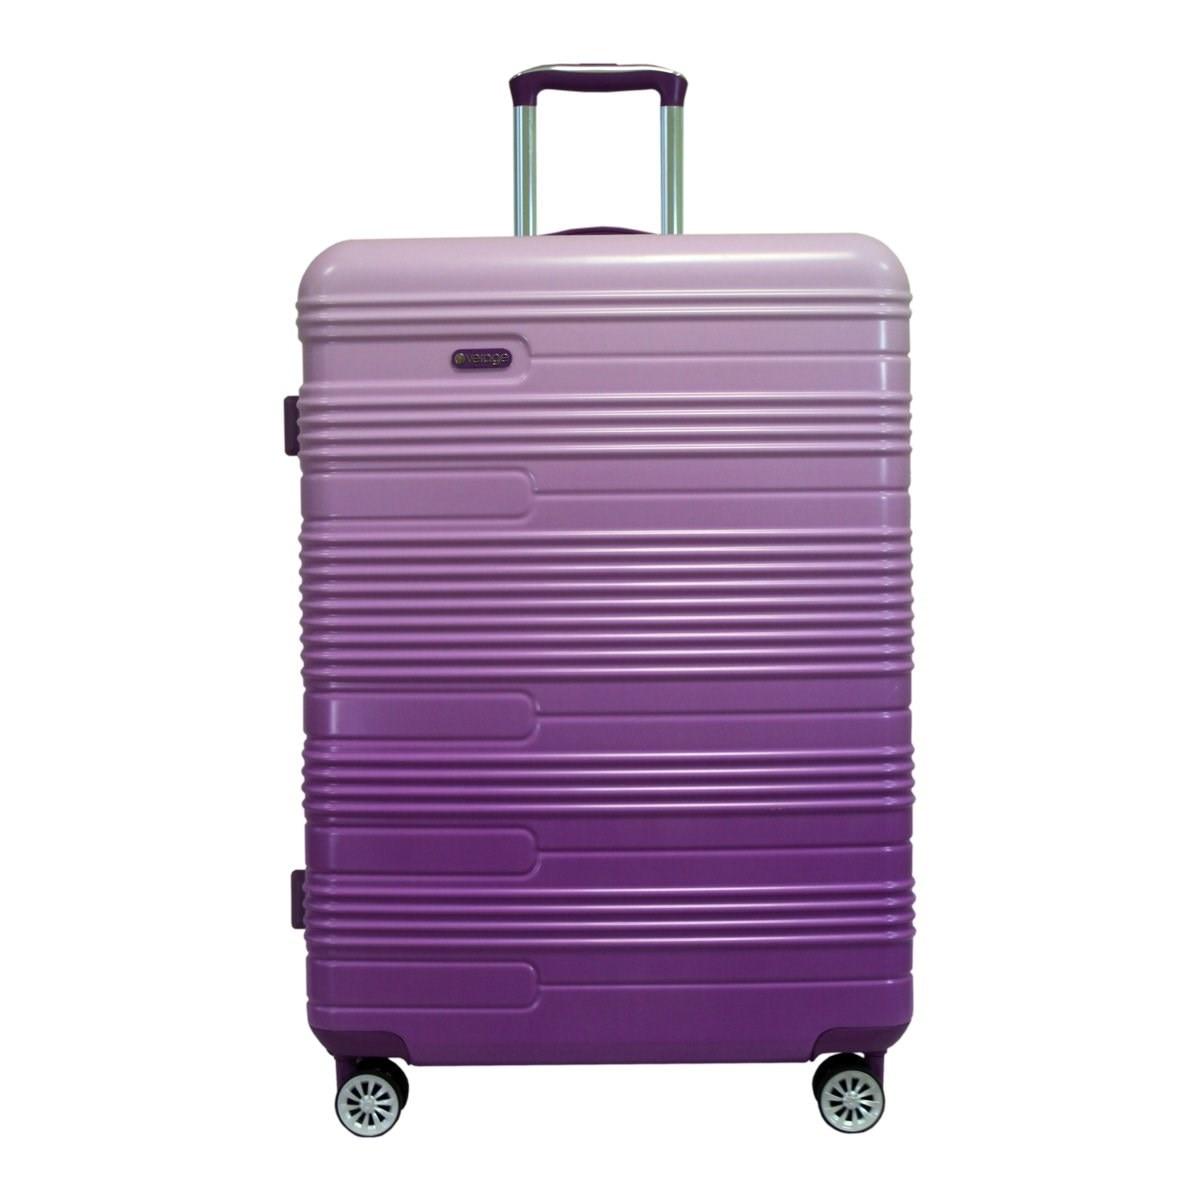 Suitcase-trolley Verage GM16037W28 purple